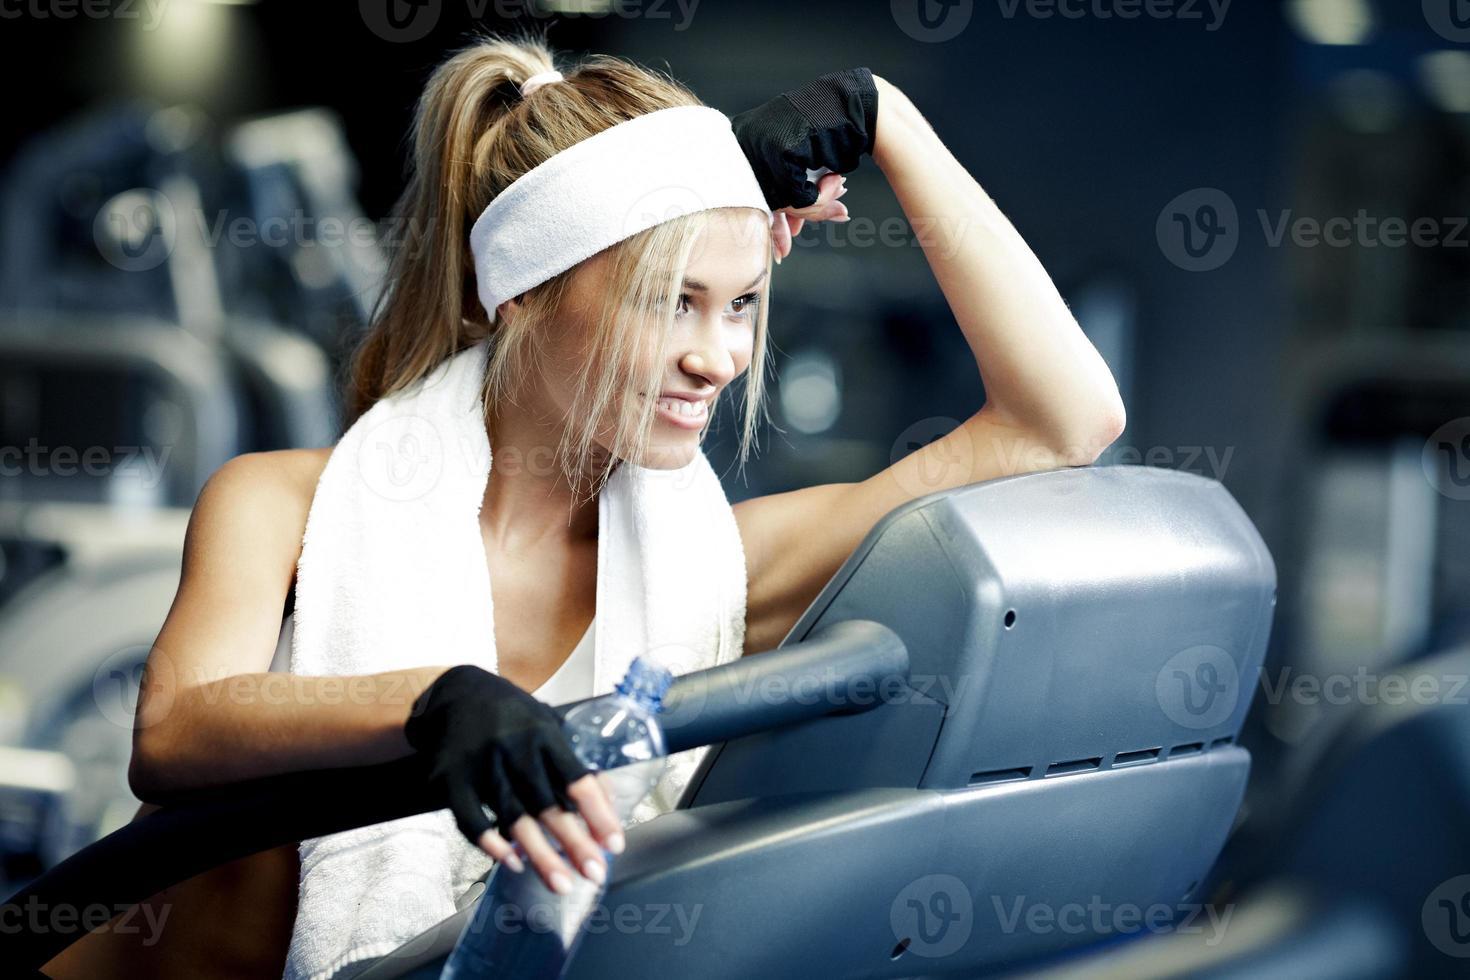 Fitness on a treadmill photo